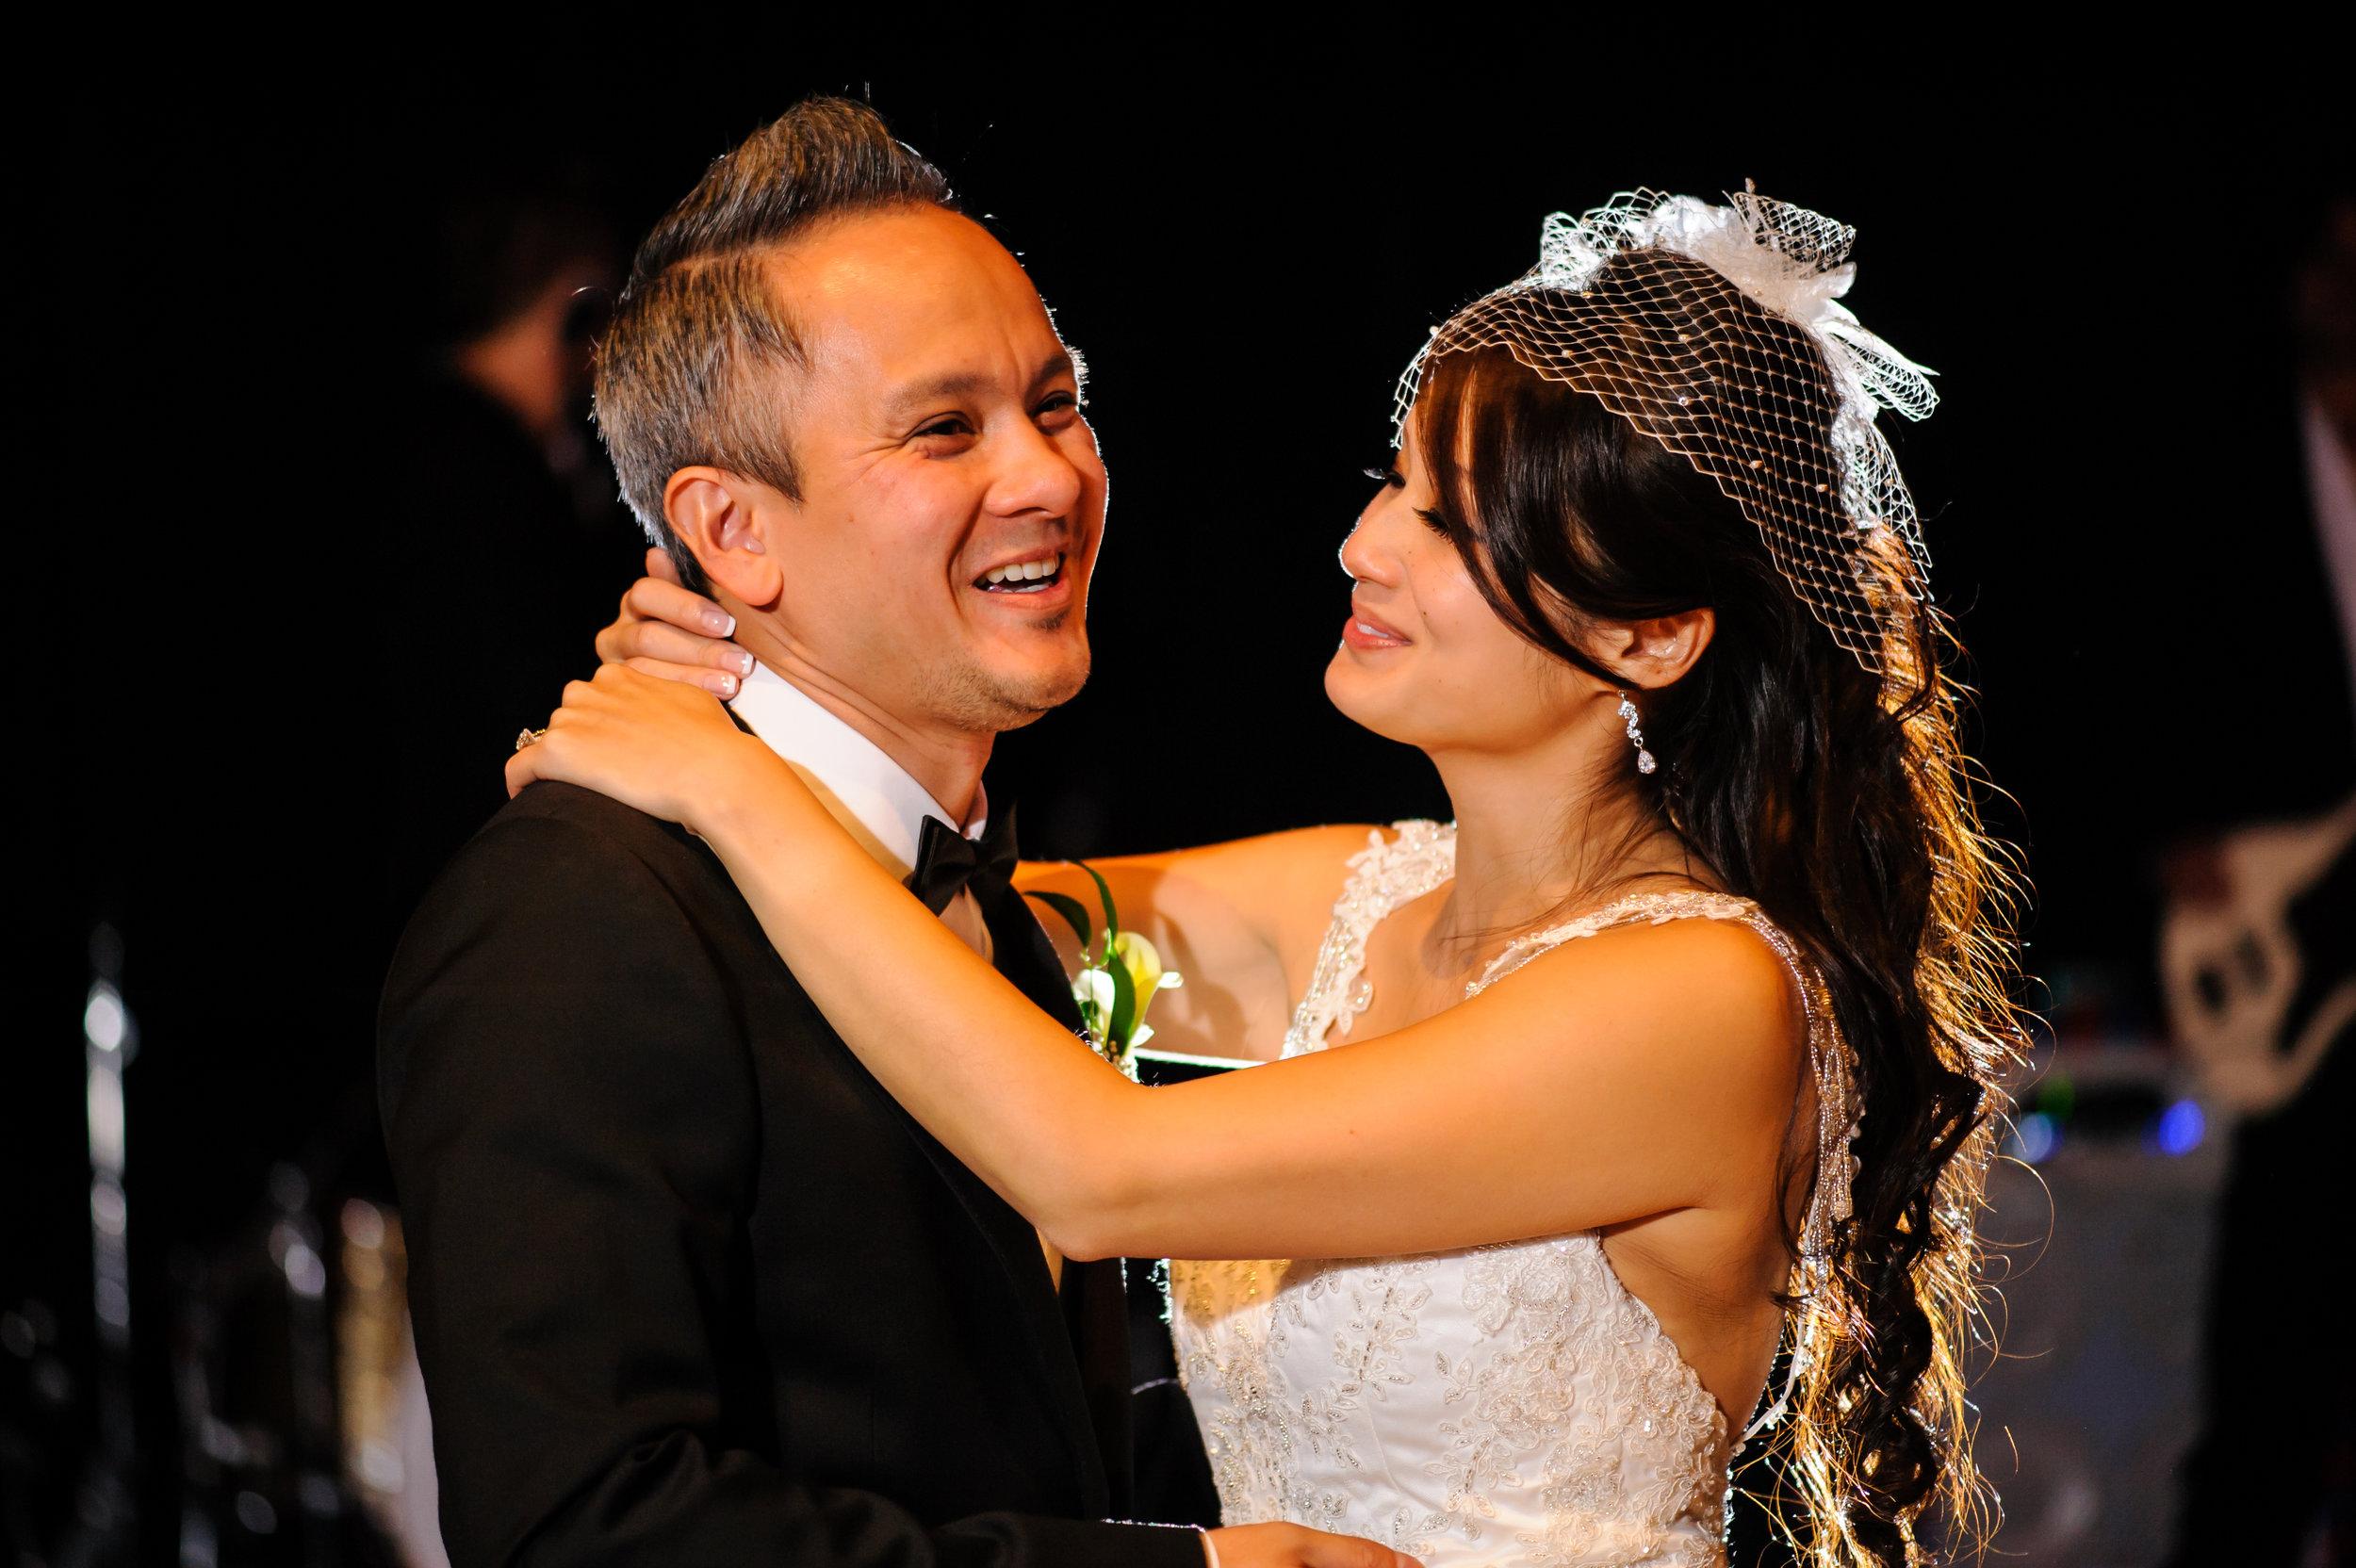 camilla-thuy-073-memorial-auditorium-sacramento-wedding-photographer-katherine-nicole-photography.JPG